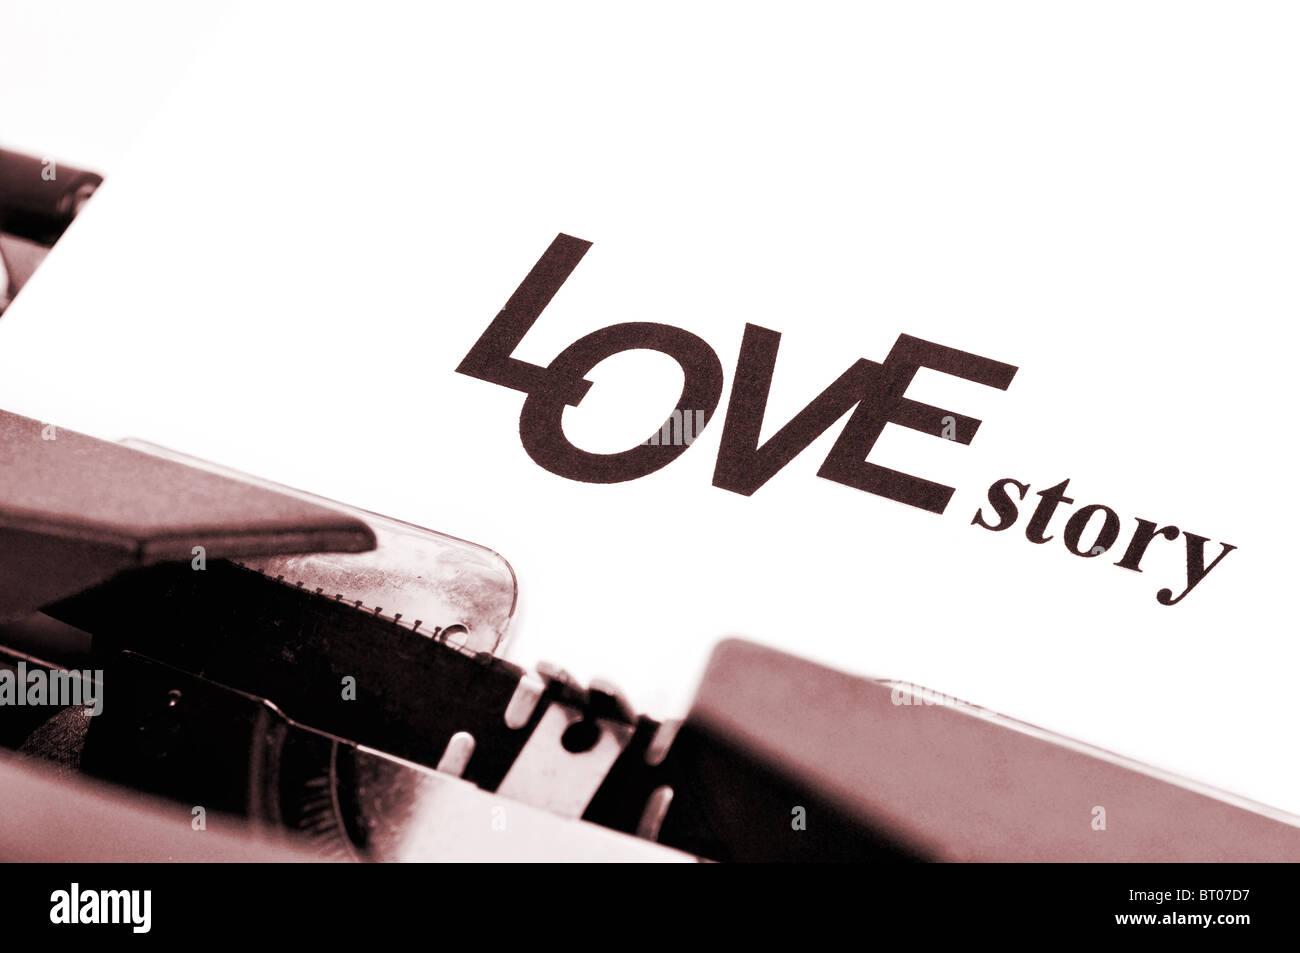 typewriter printed on a white sheet 'love story' - Stock Image